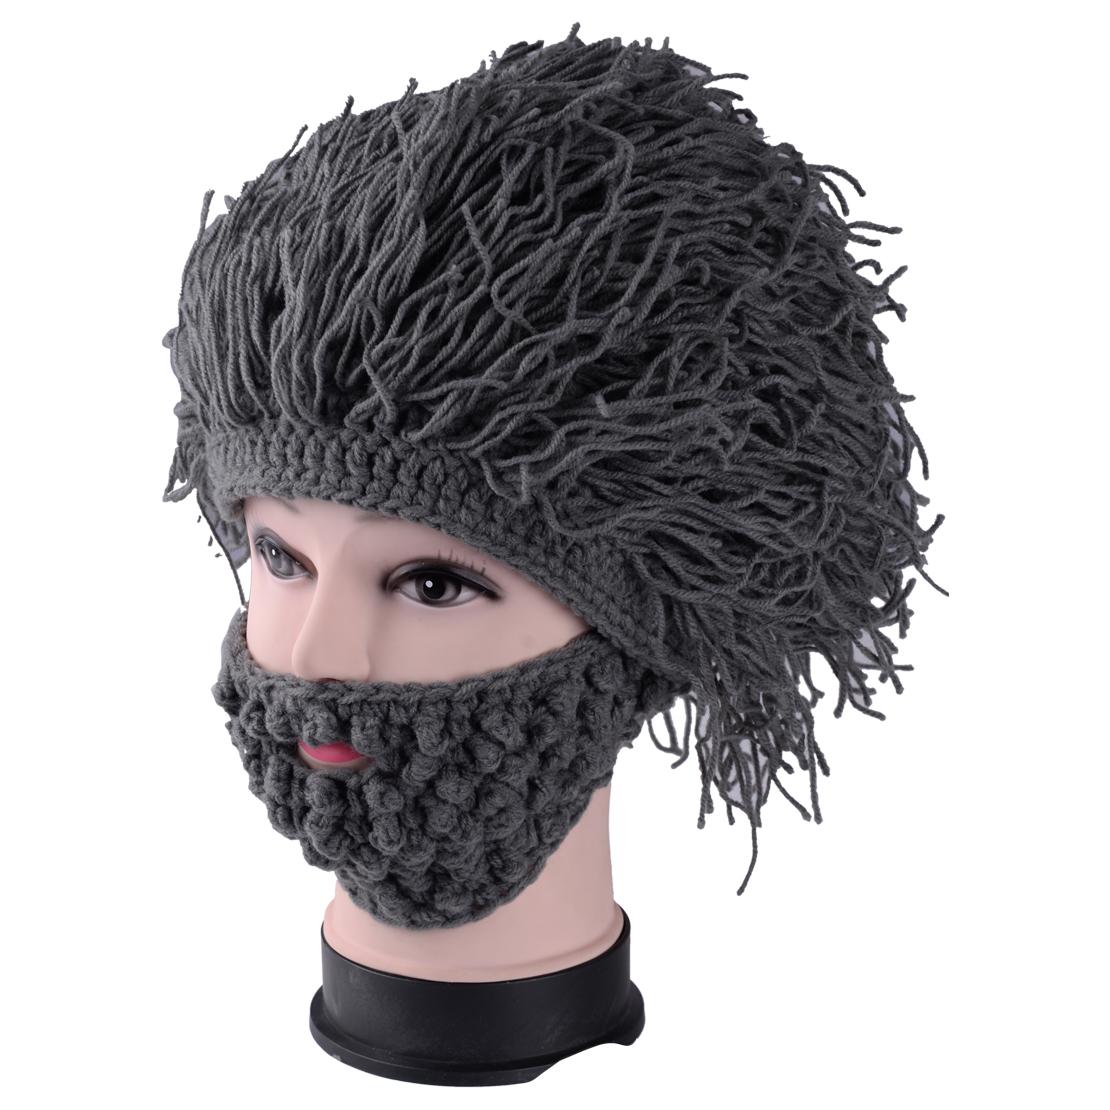 947283decff Details about hand knitted crochet beanie cap hat mask winter funny  creative beard caveman jpg 1110x1110